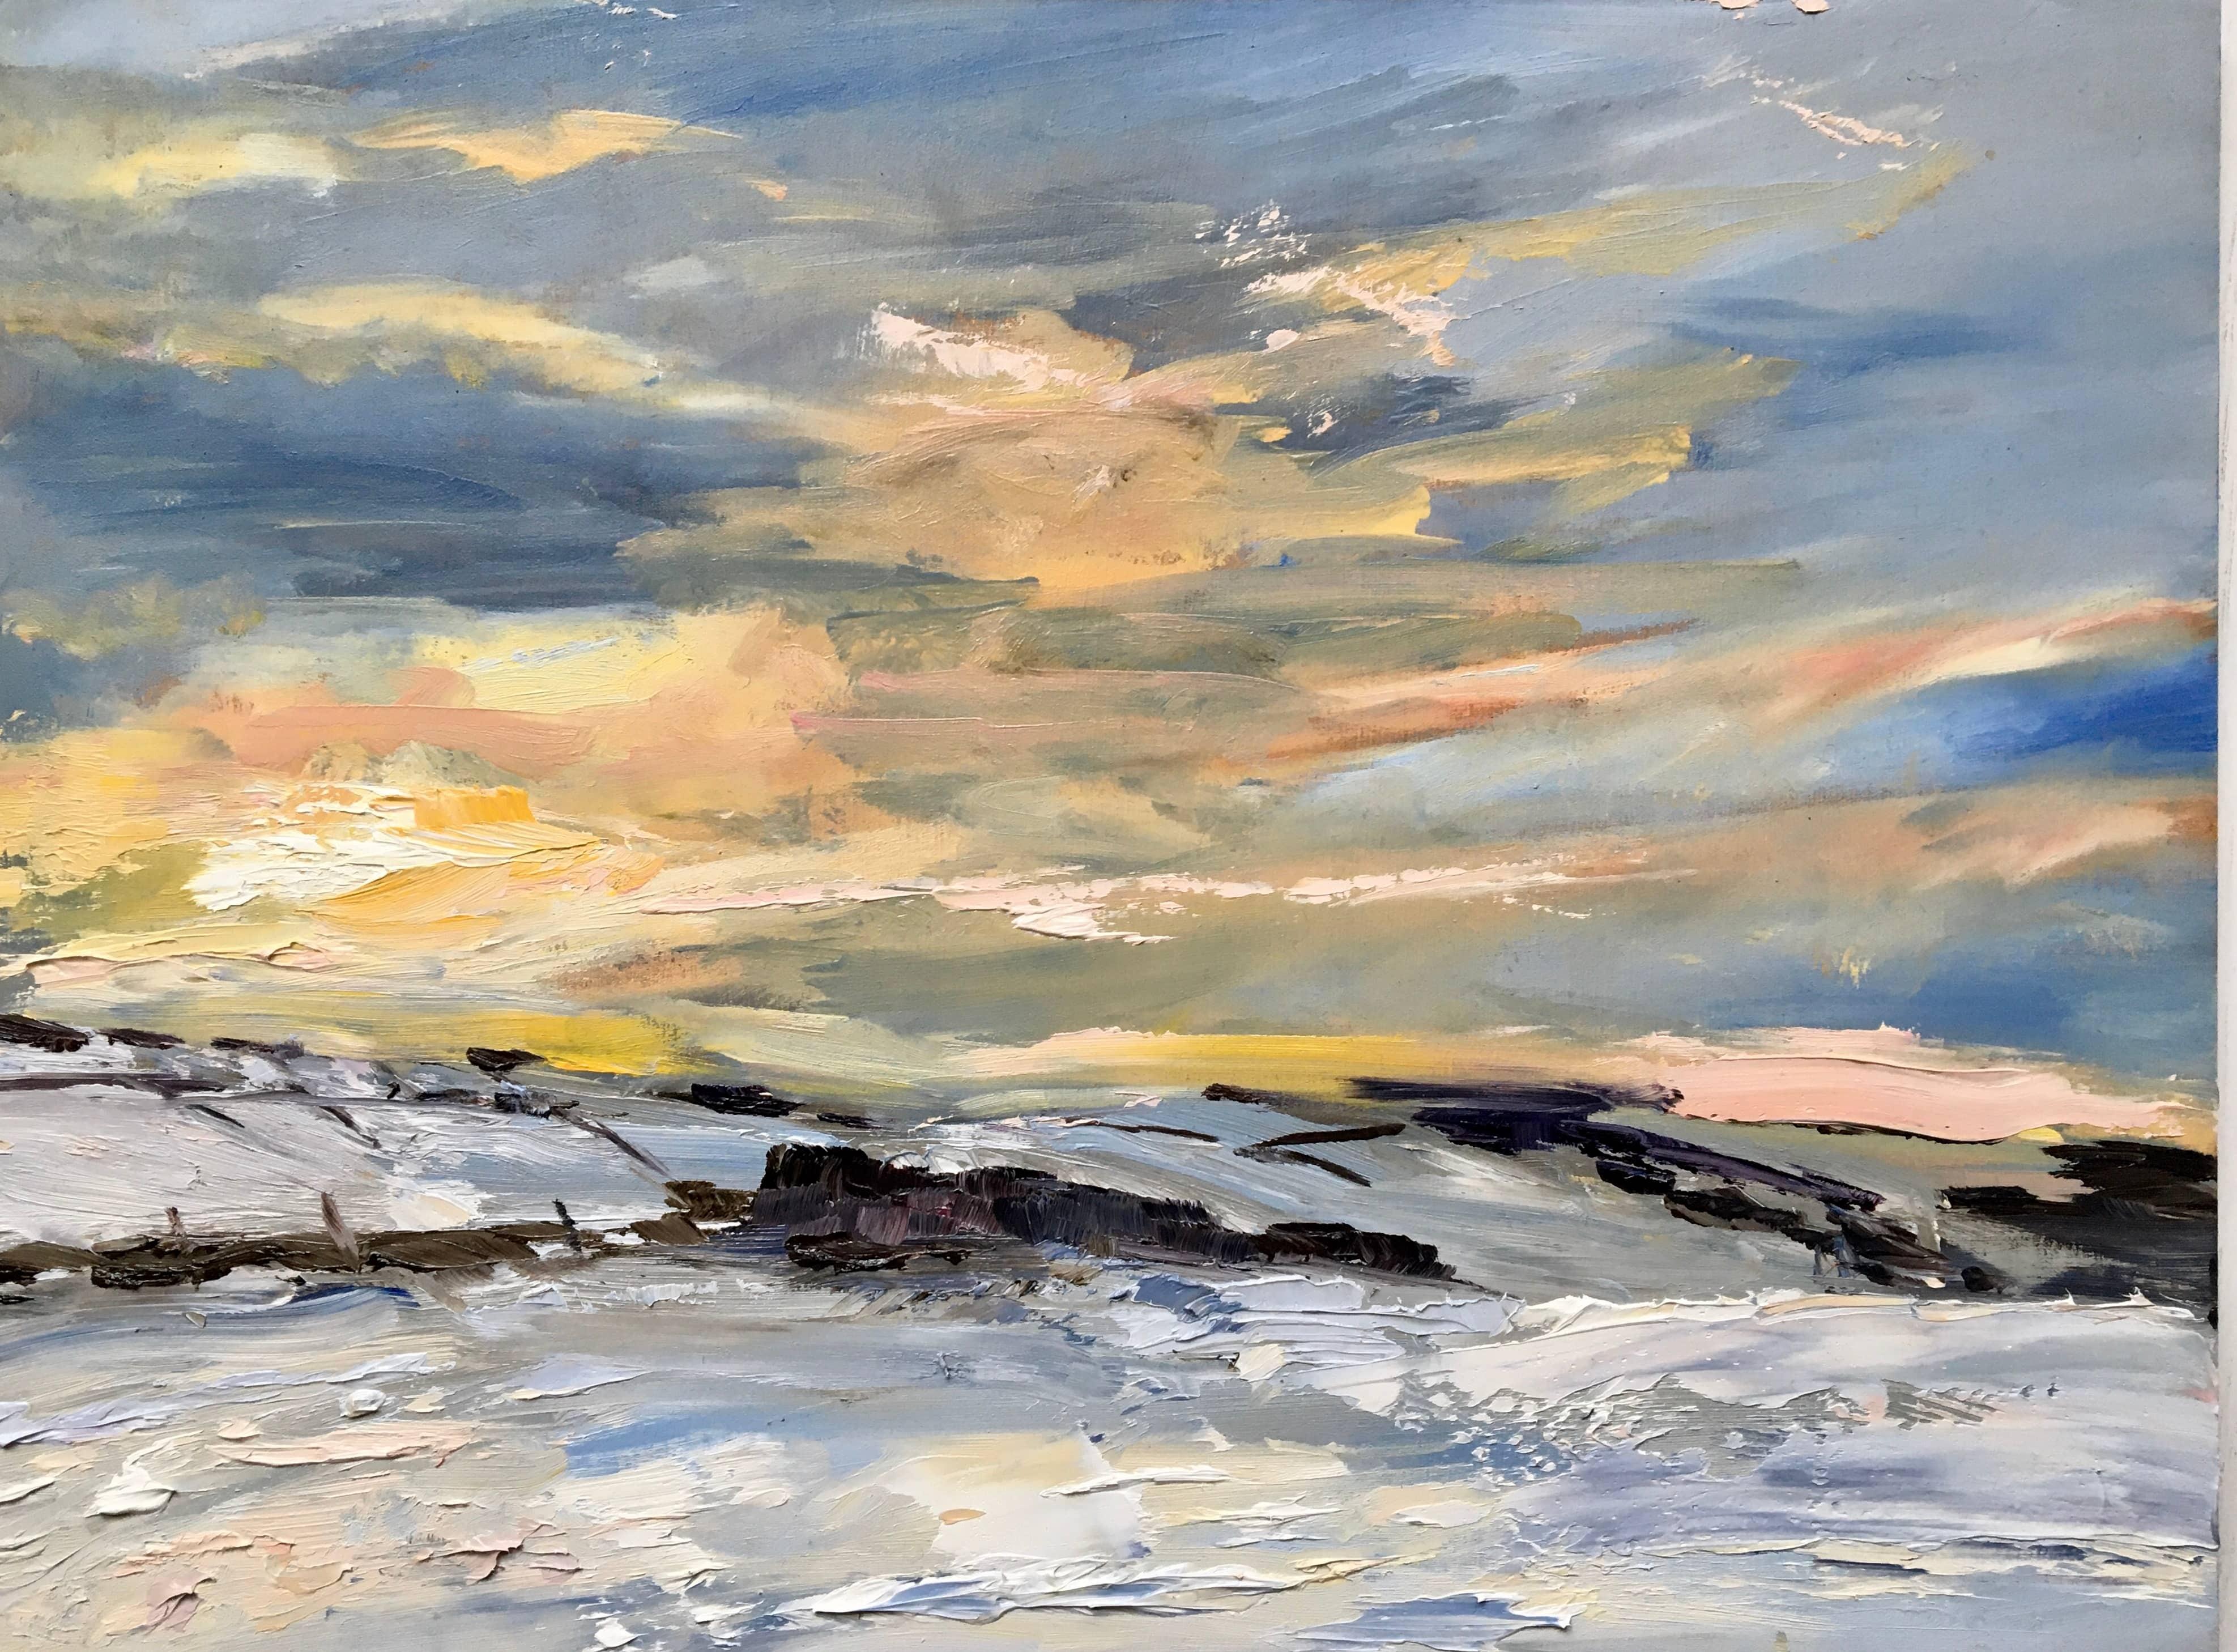 Sunset snow scene landscape painting in oils